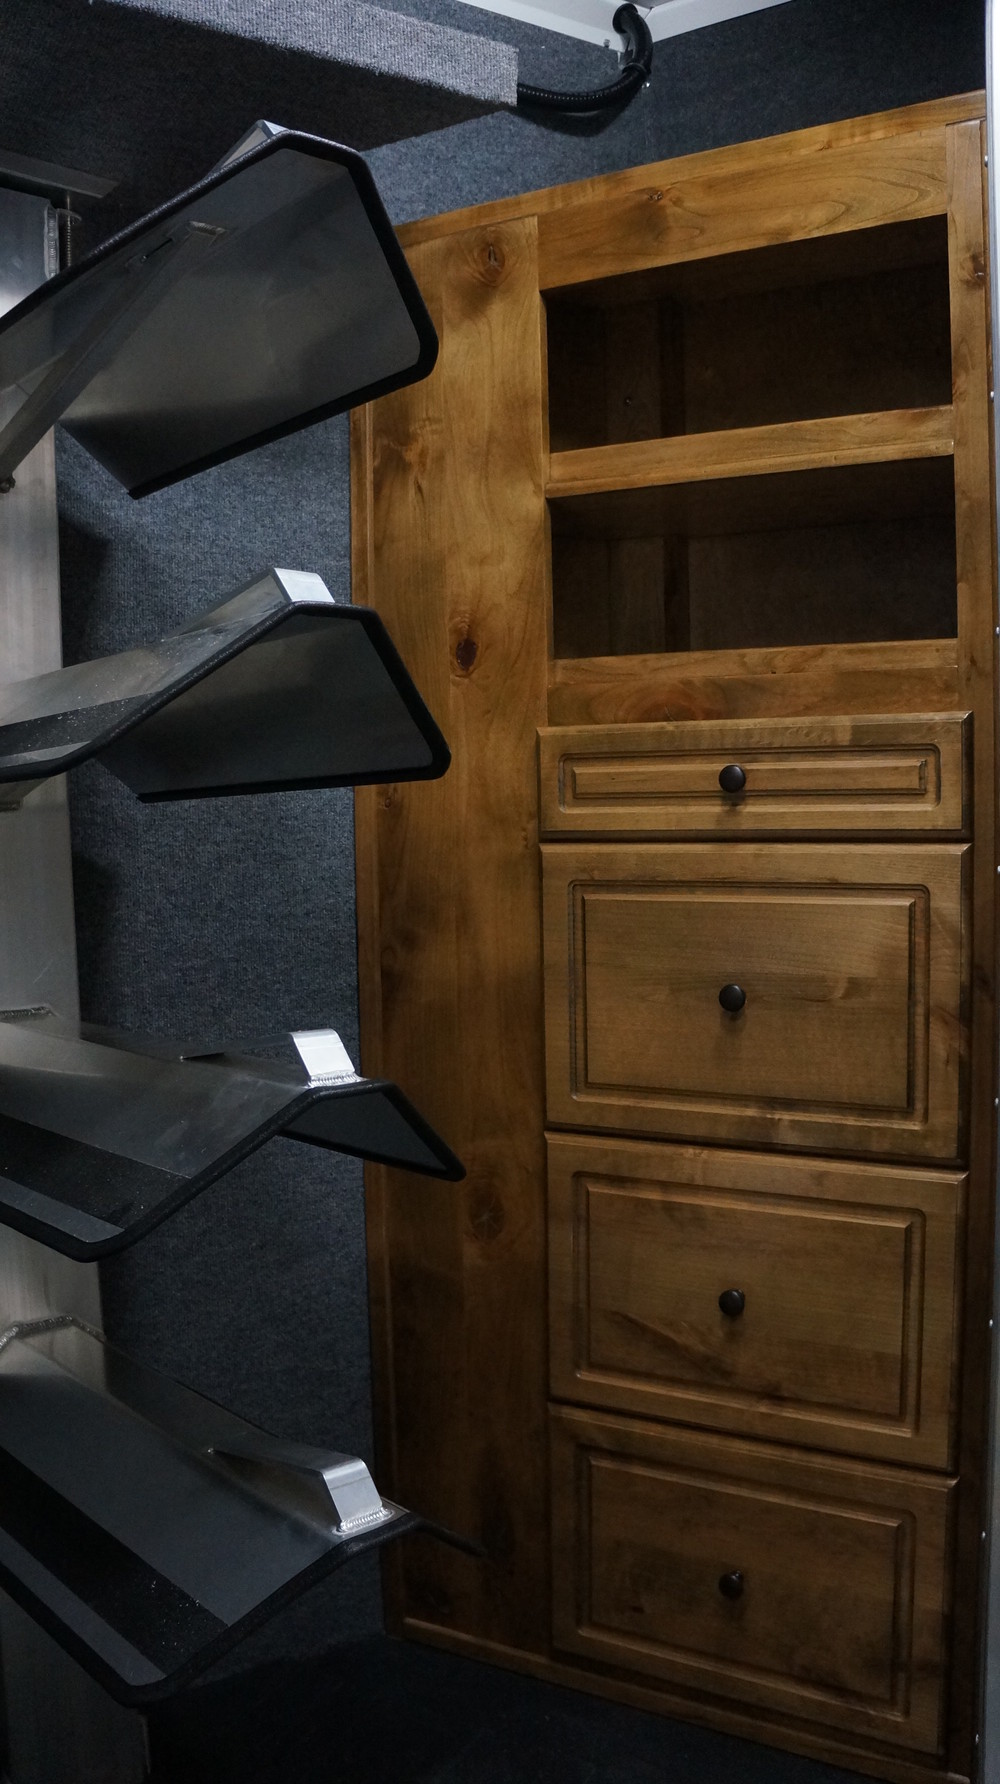 Rear Tack Cabinets